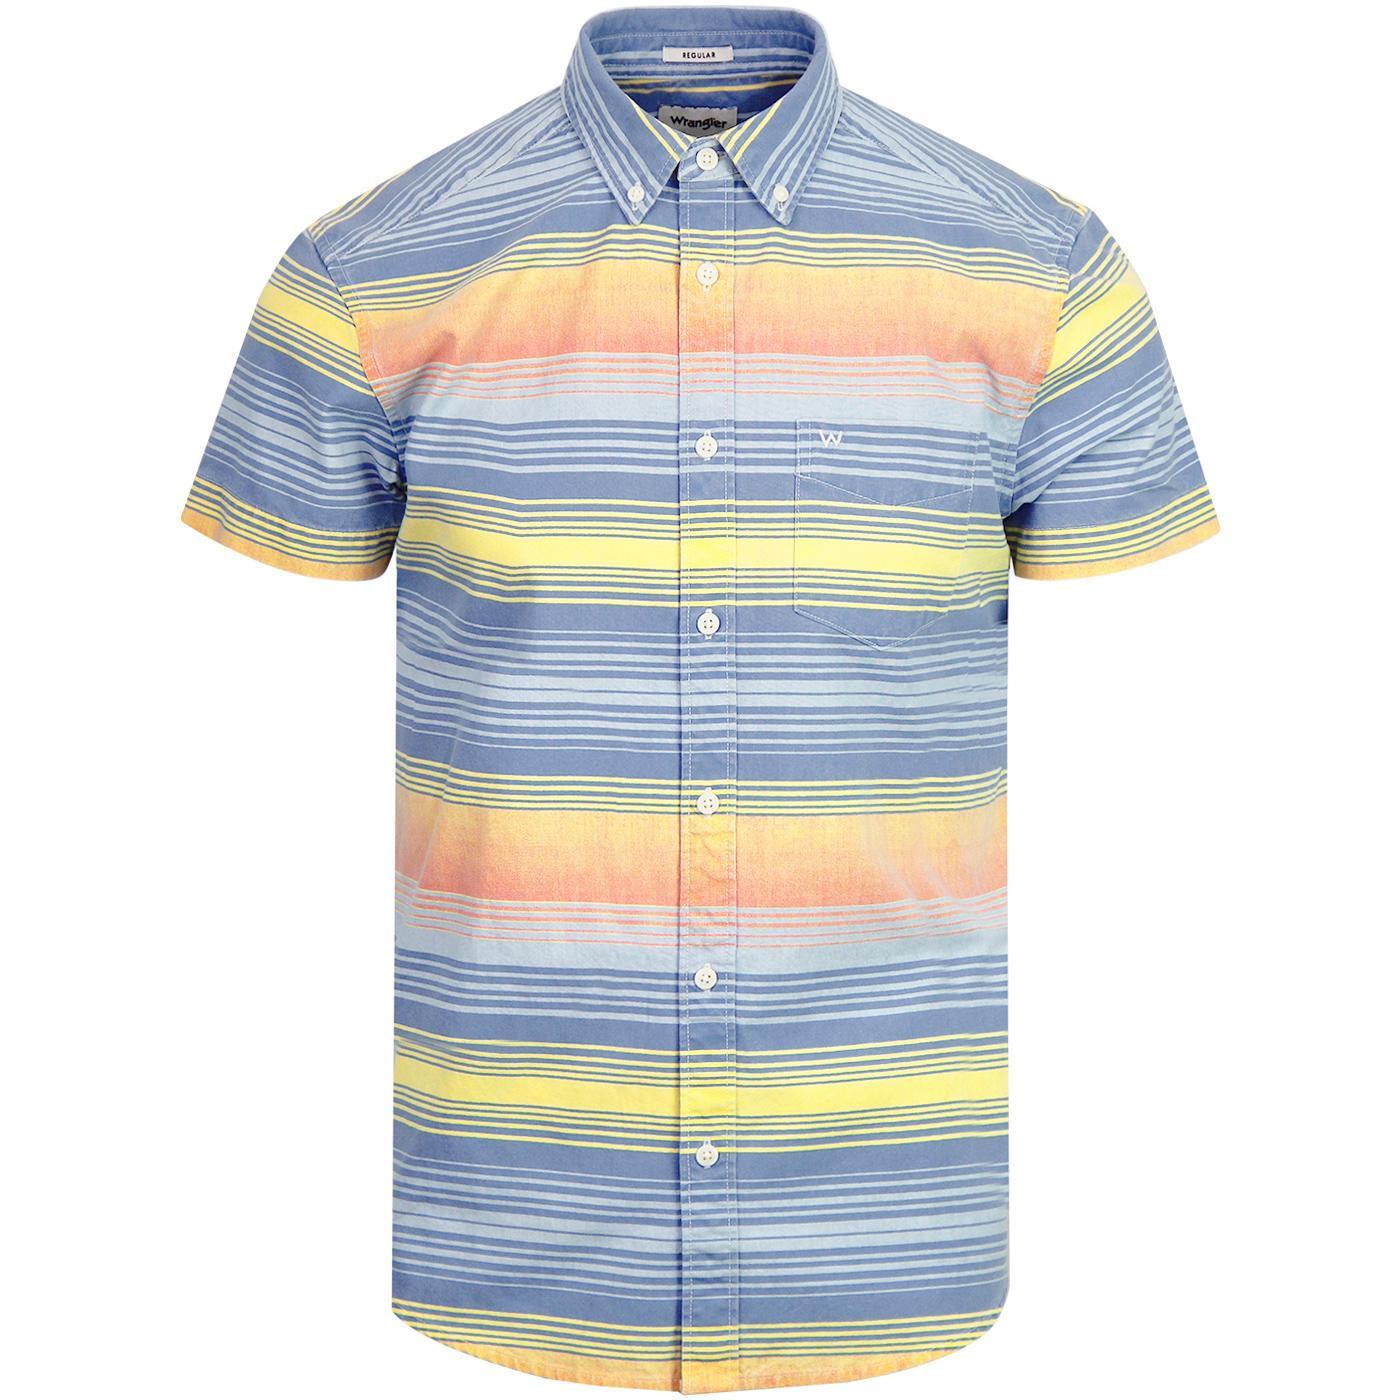 WRANGLER 1 Pkt Gradient Colour Block Stripe Shirt